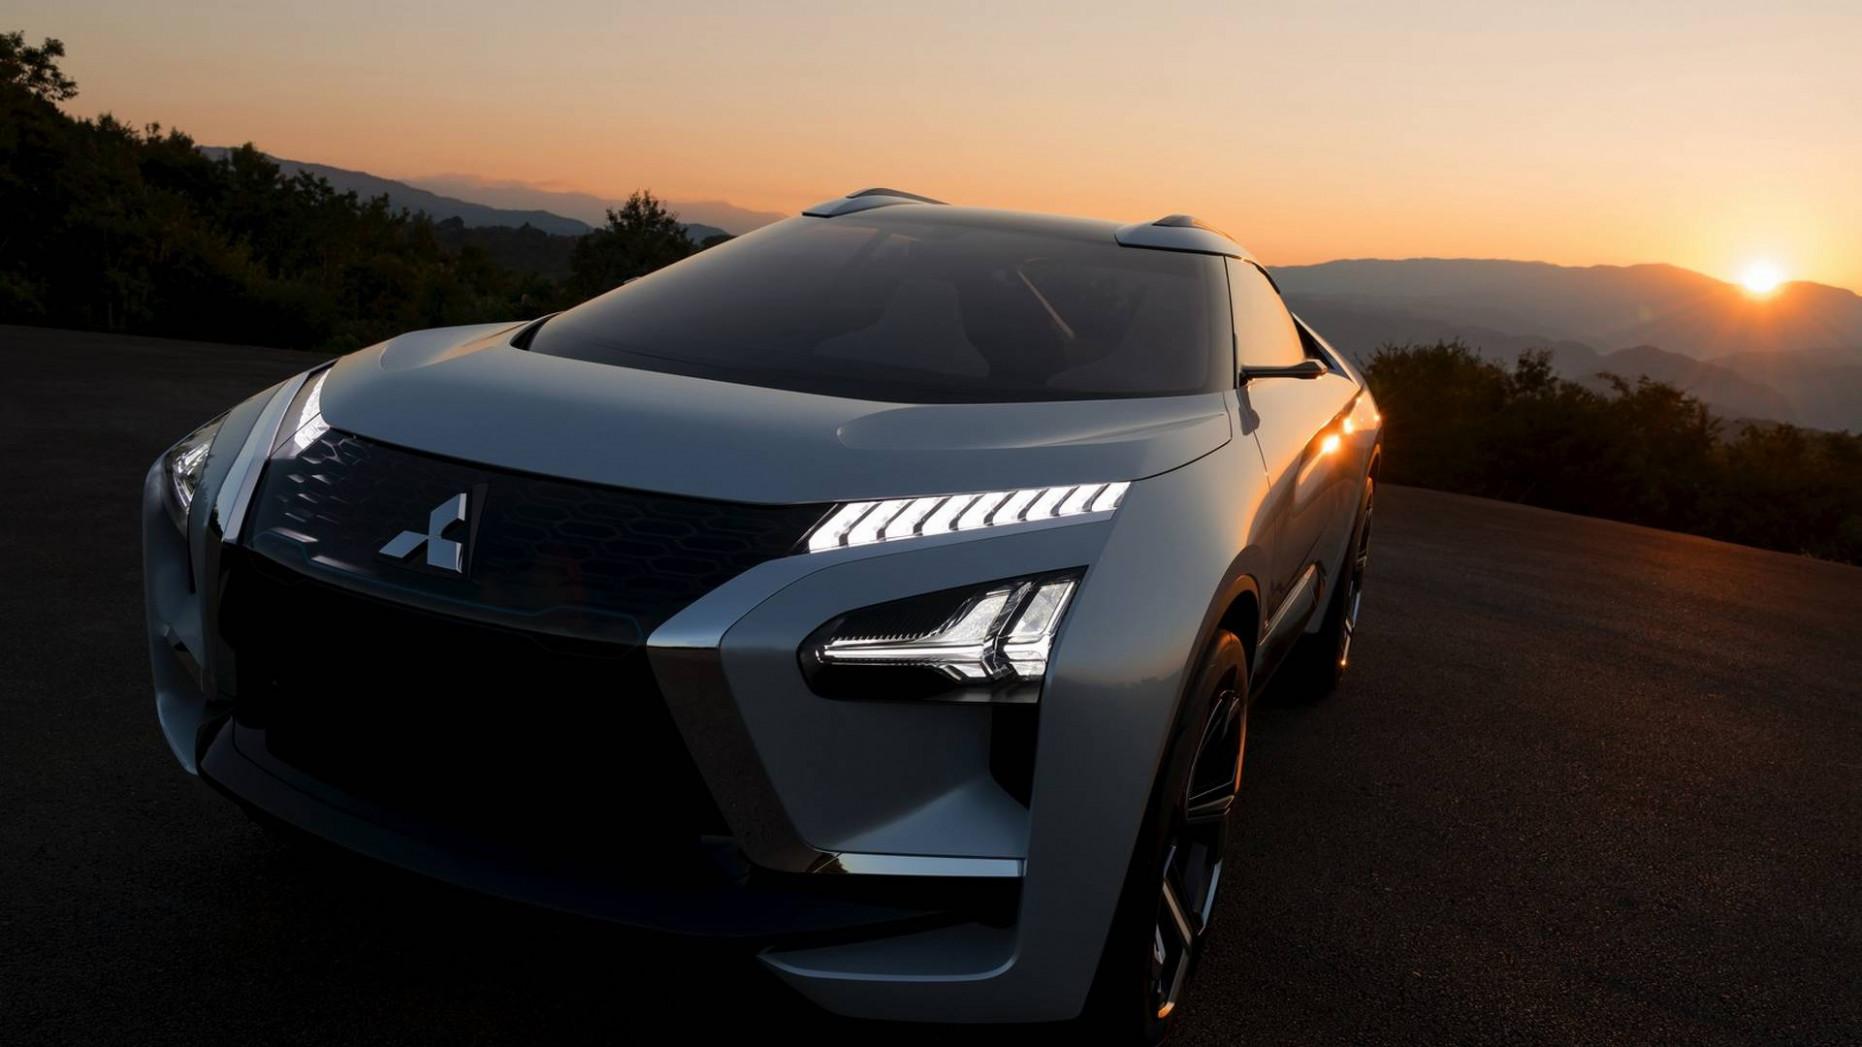 Concept and Review 2022 Mitsubishi Evo